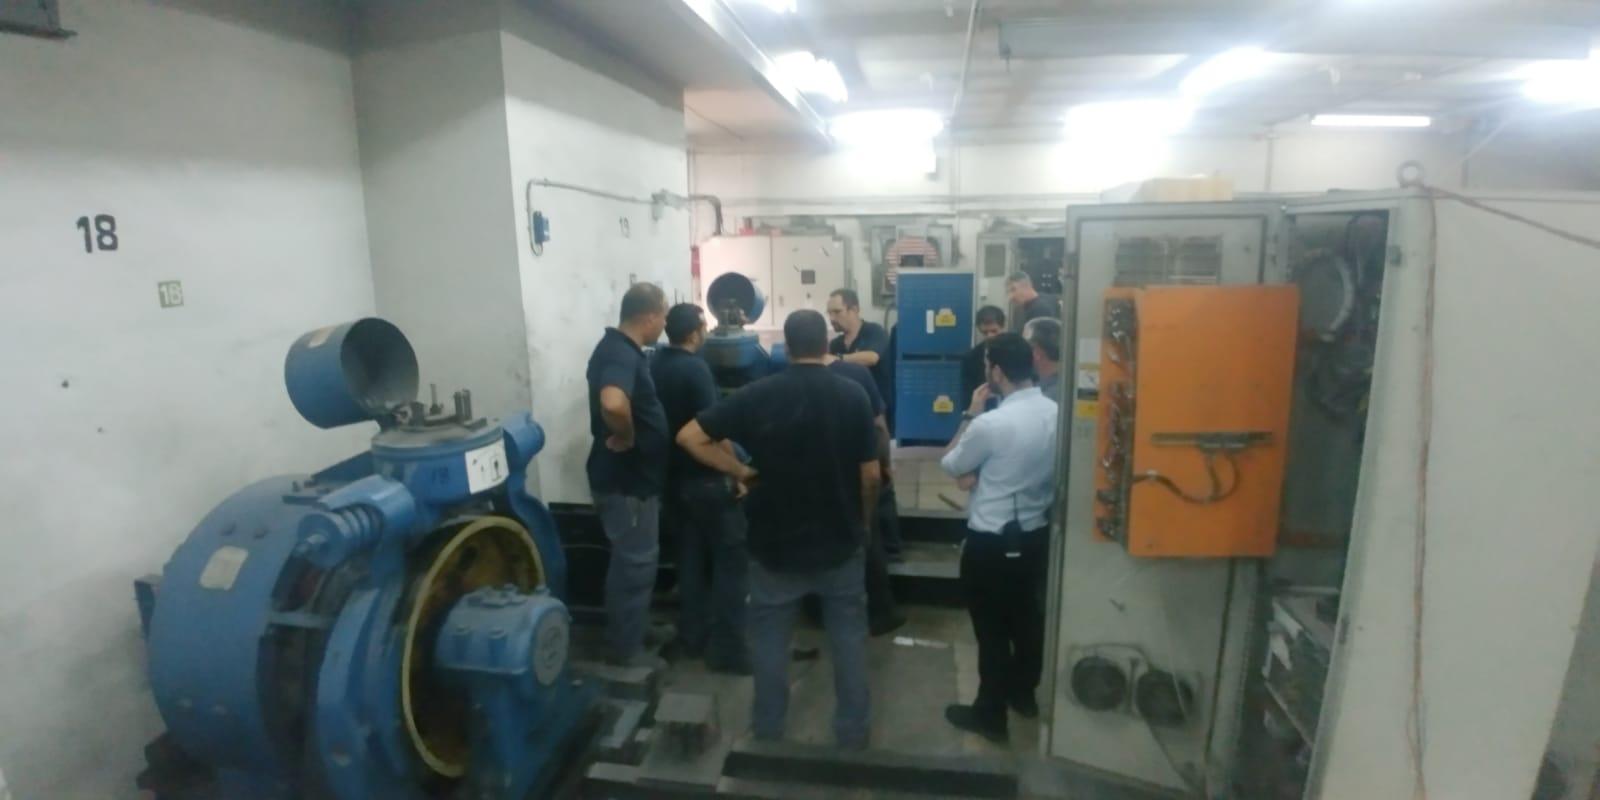 "Photo of בשל נפילת חשמל ברחבי ראשל""צ, עשרות לכודים במעליות ברחבי העיר. צוותי לוחמי אש פועלים לחילוץ הלכודים"